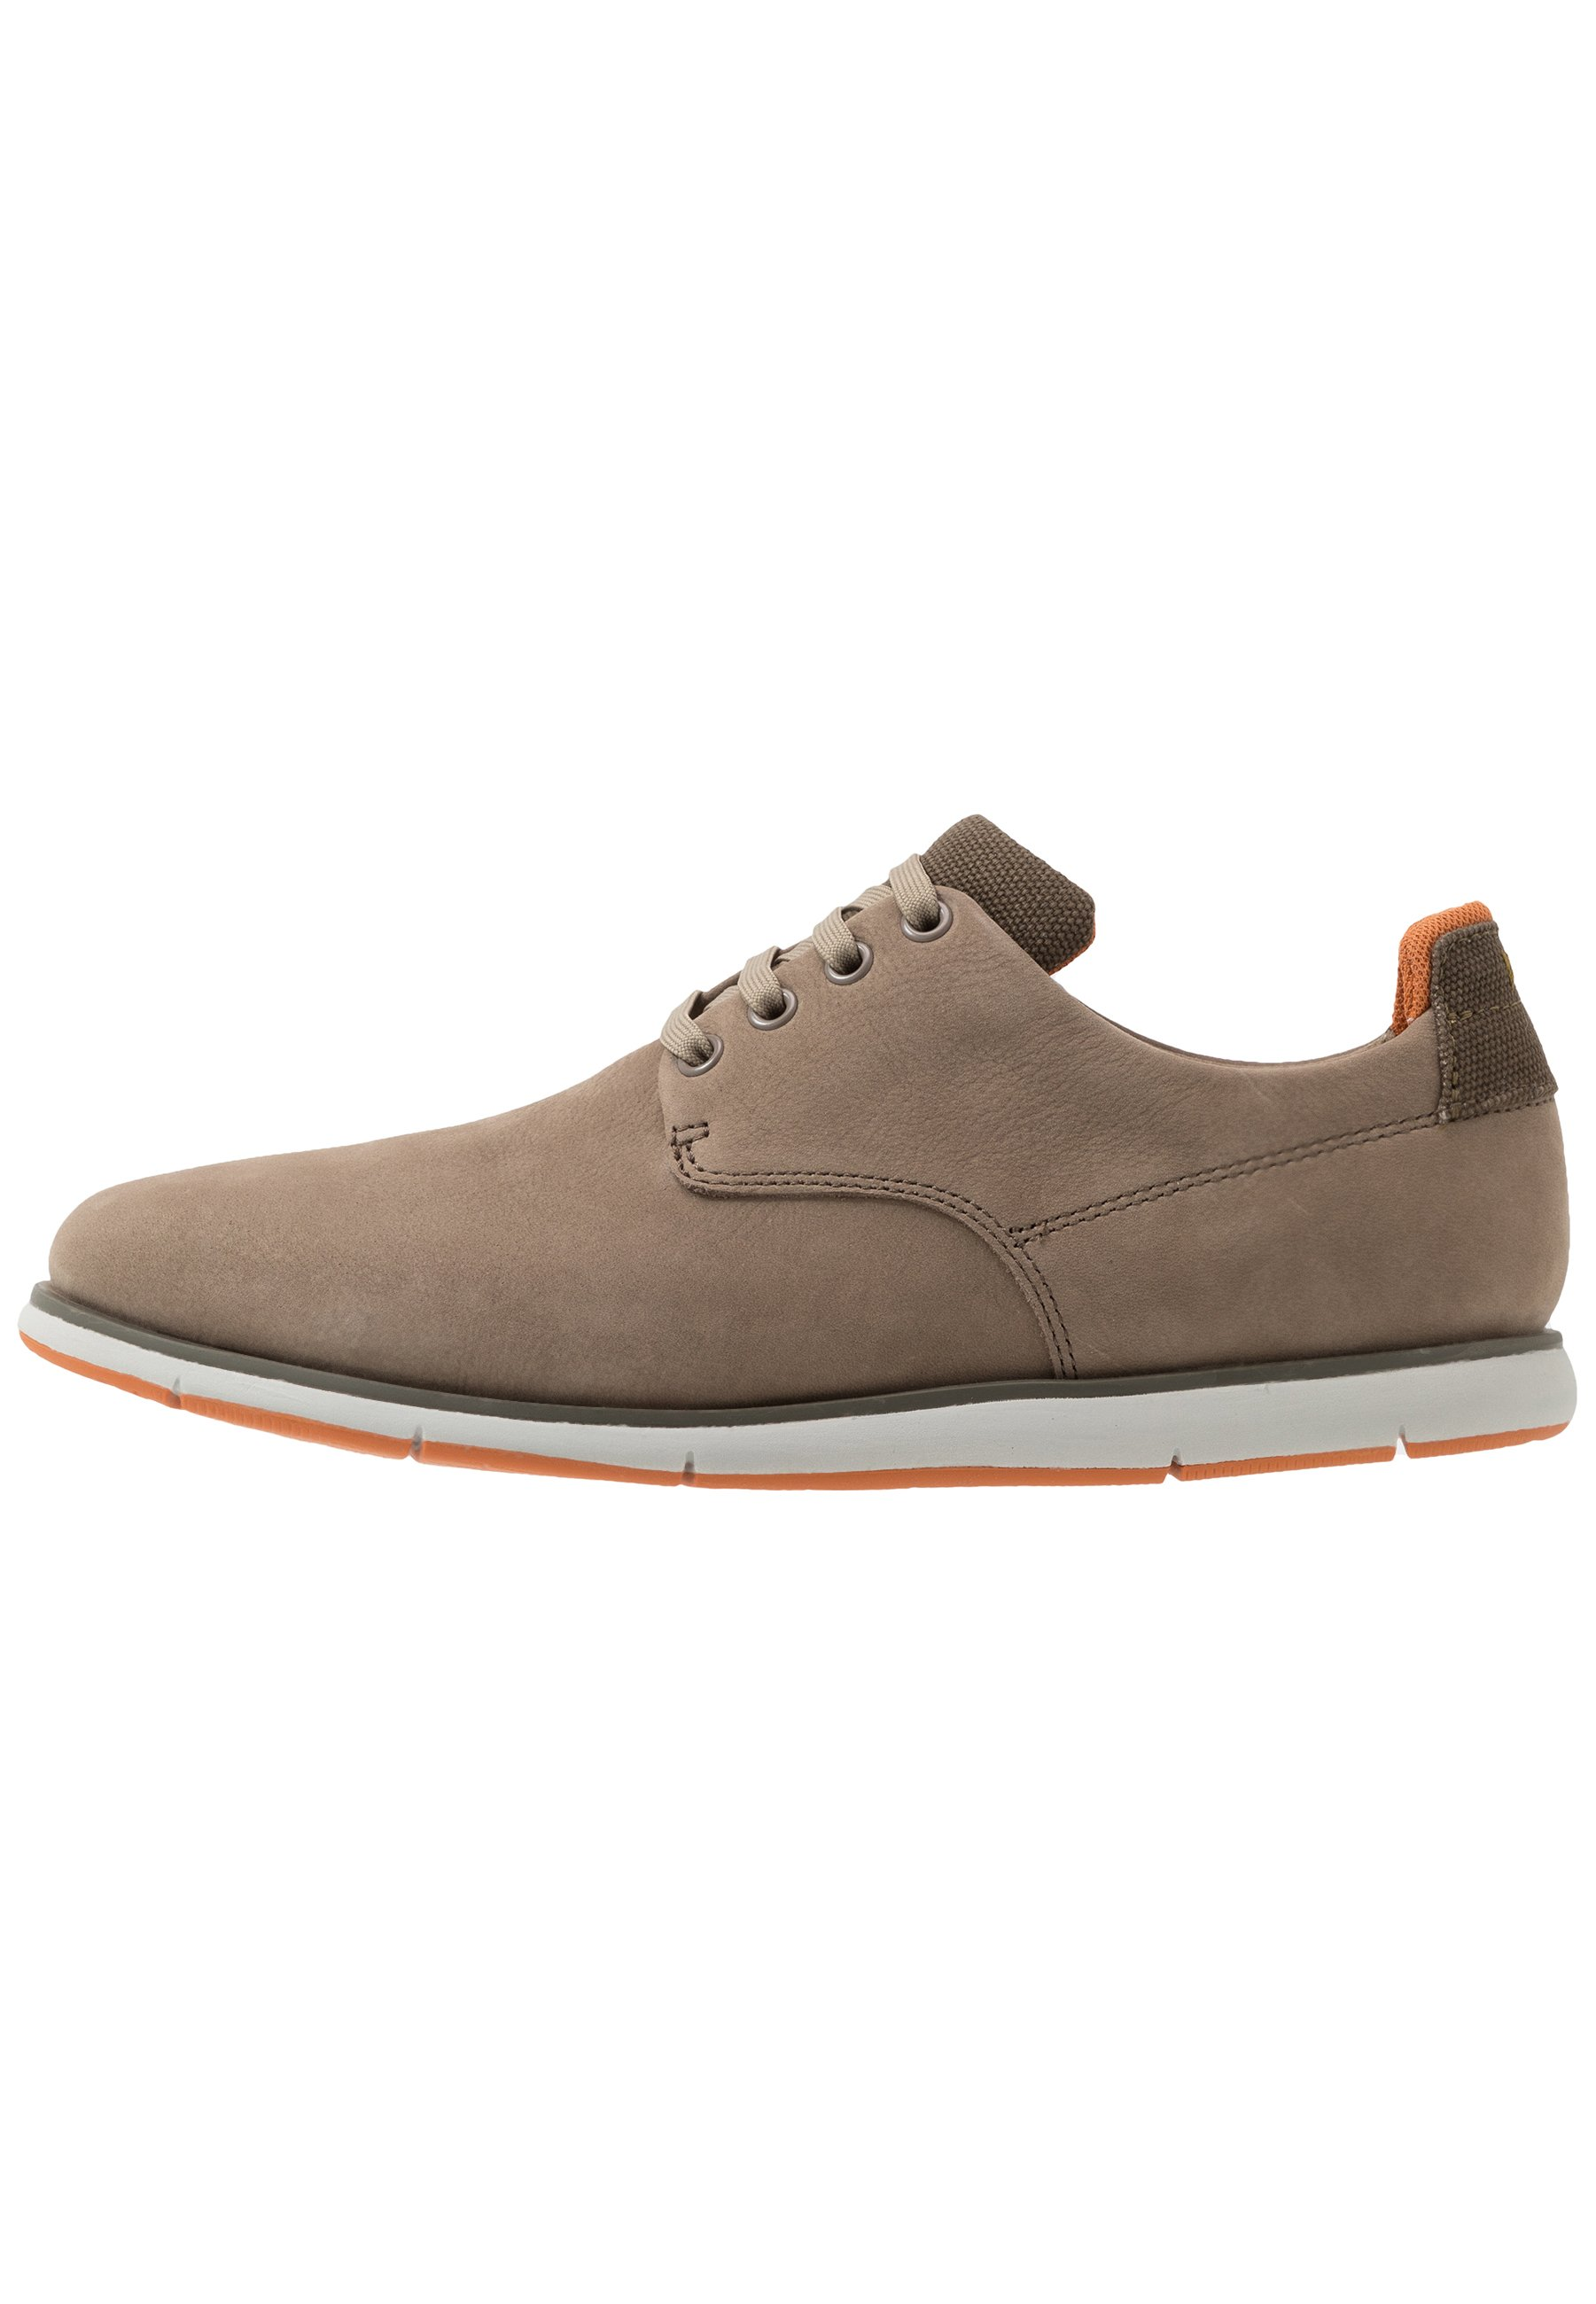 Homme CAMALEON SMITH - Chaussures à lacets